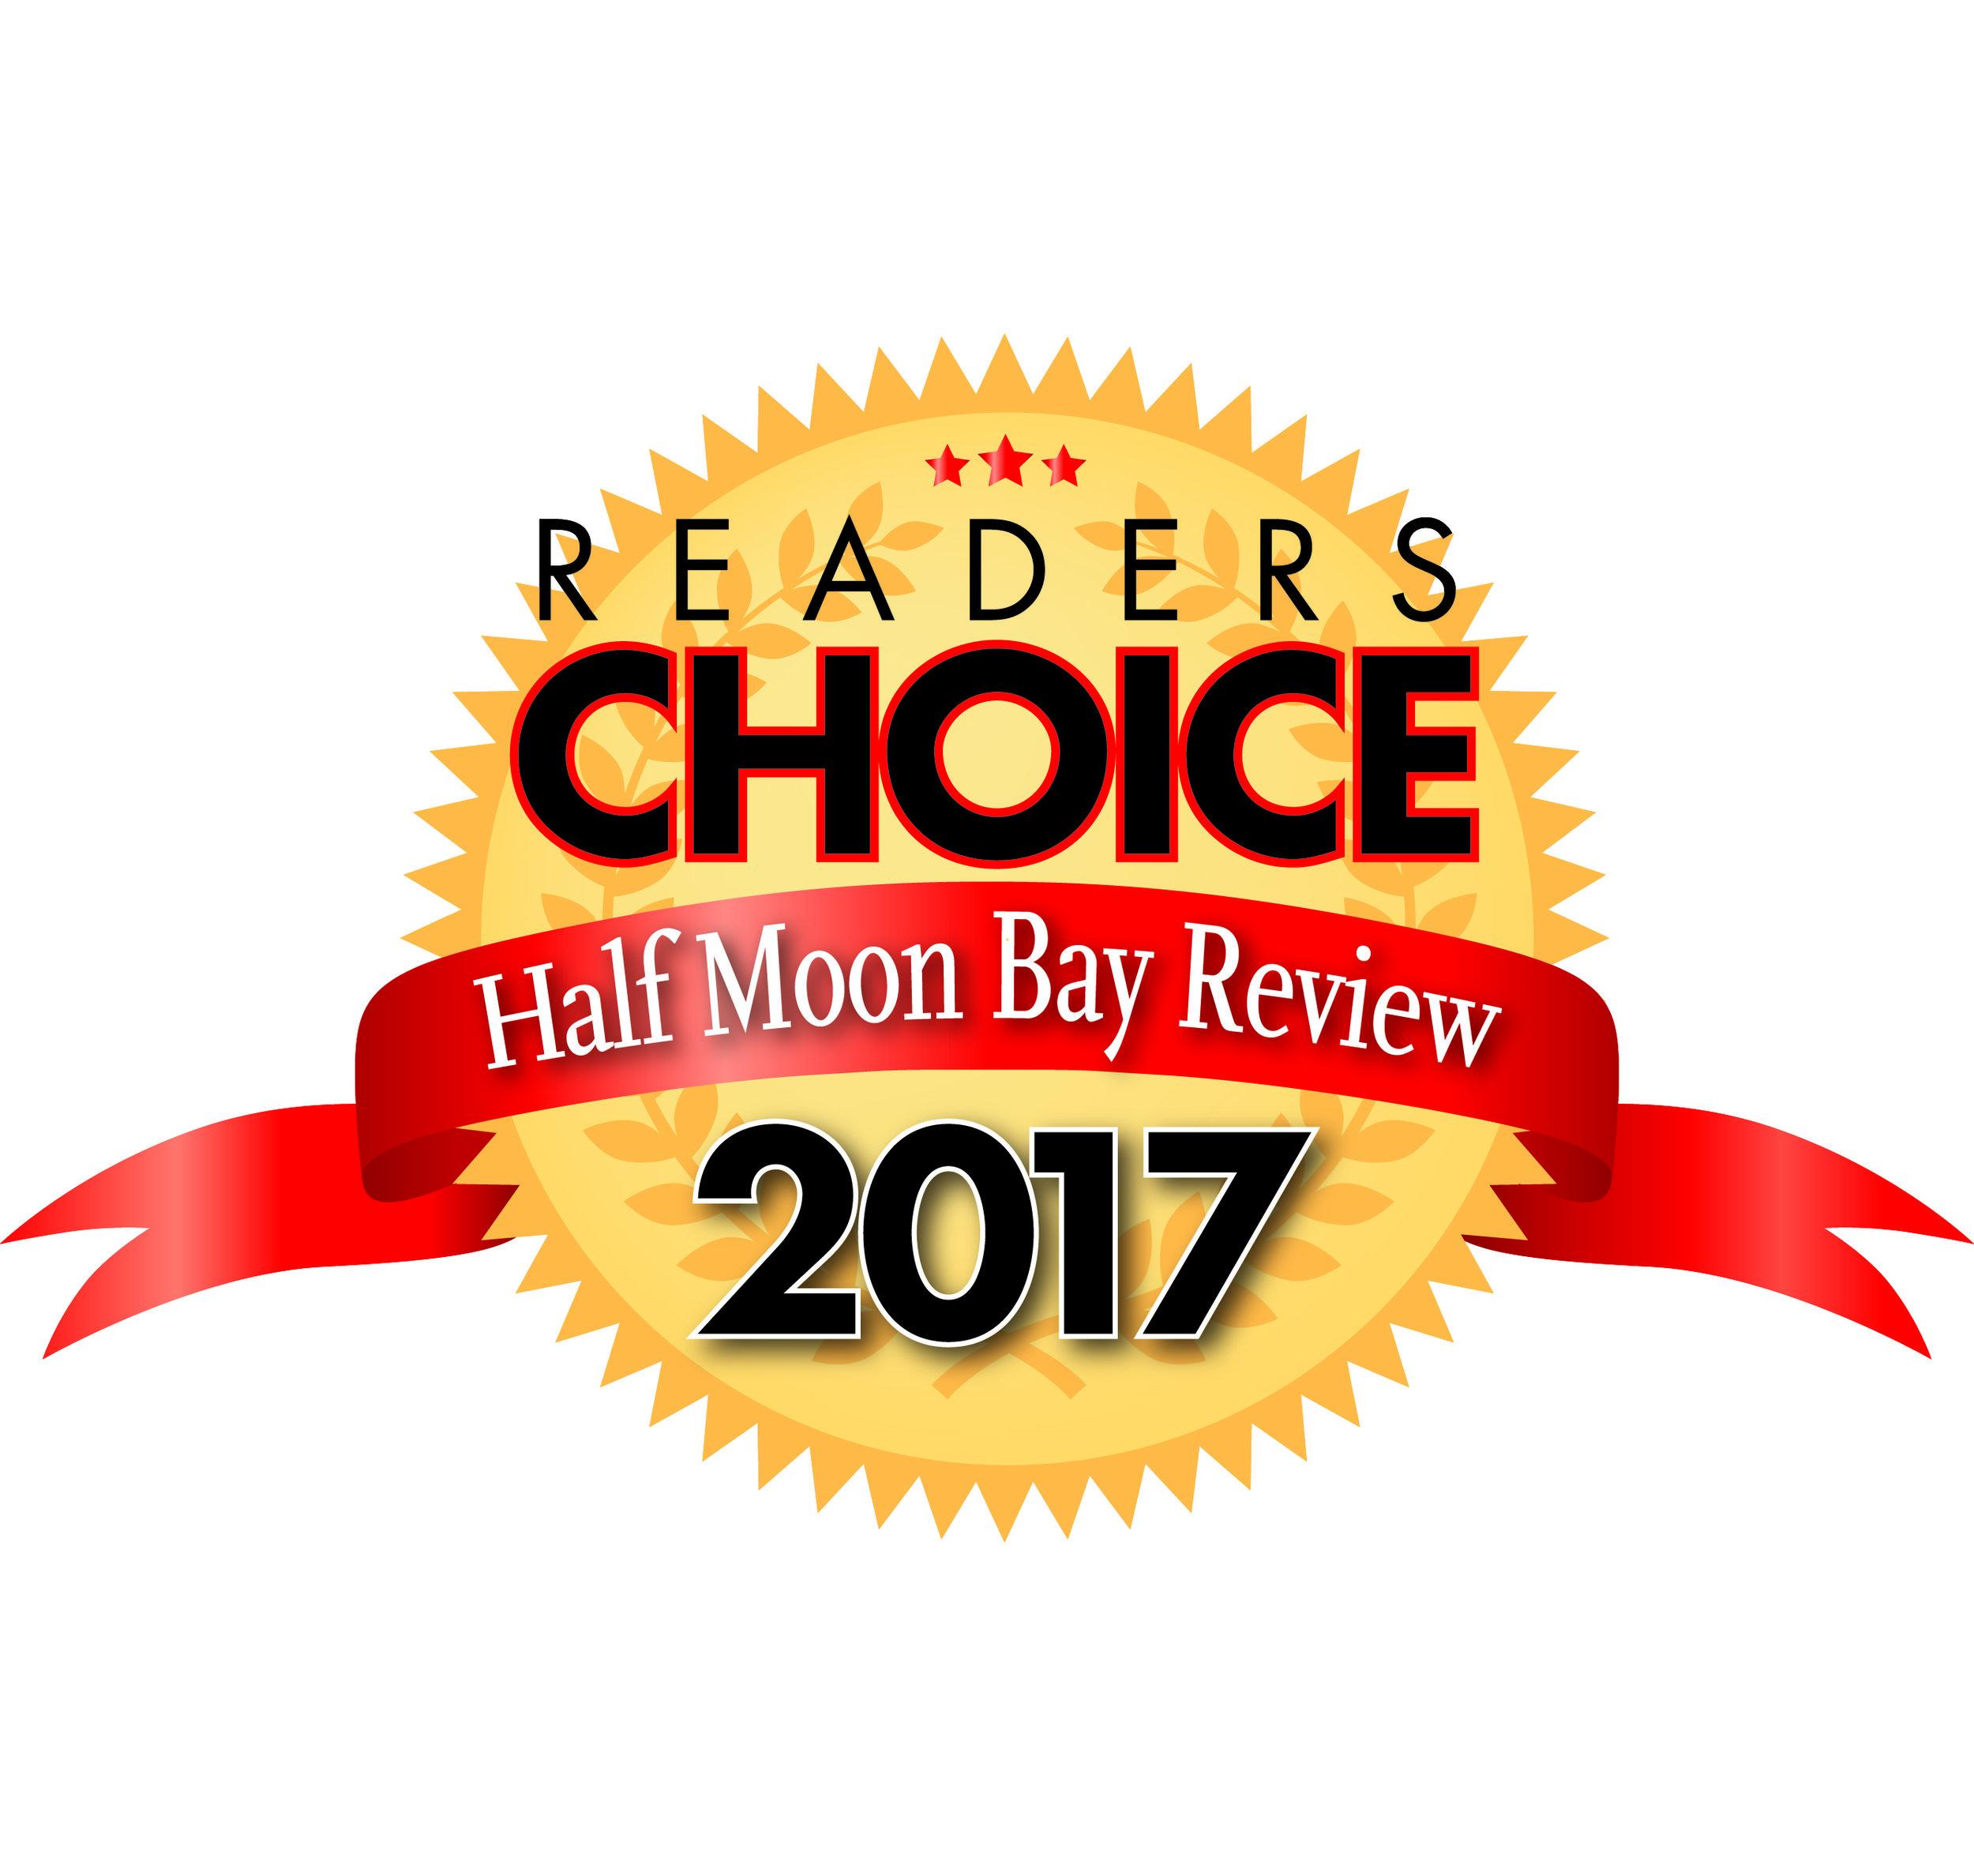 Readers Choice2017logo.jpg